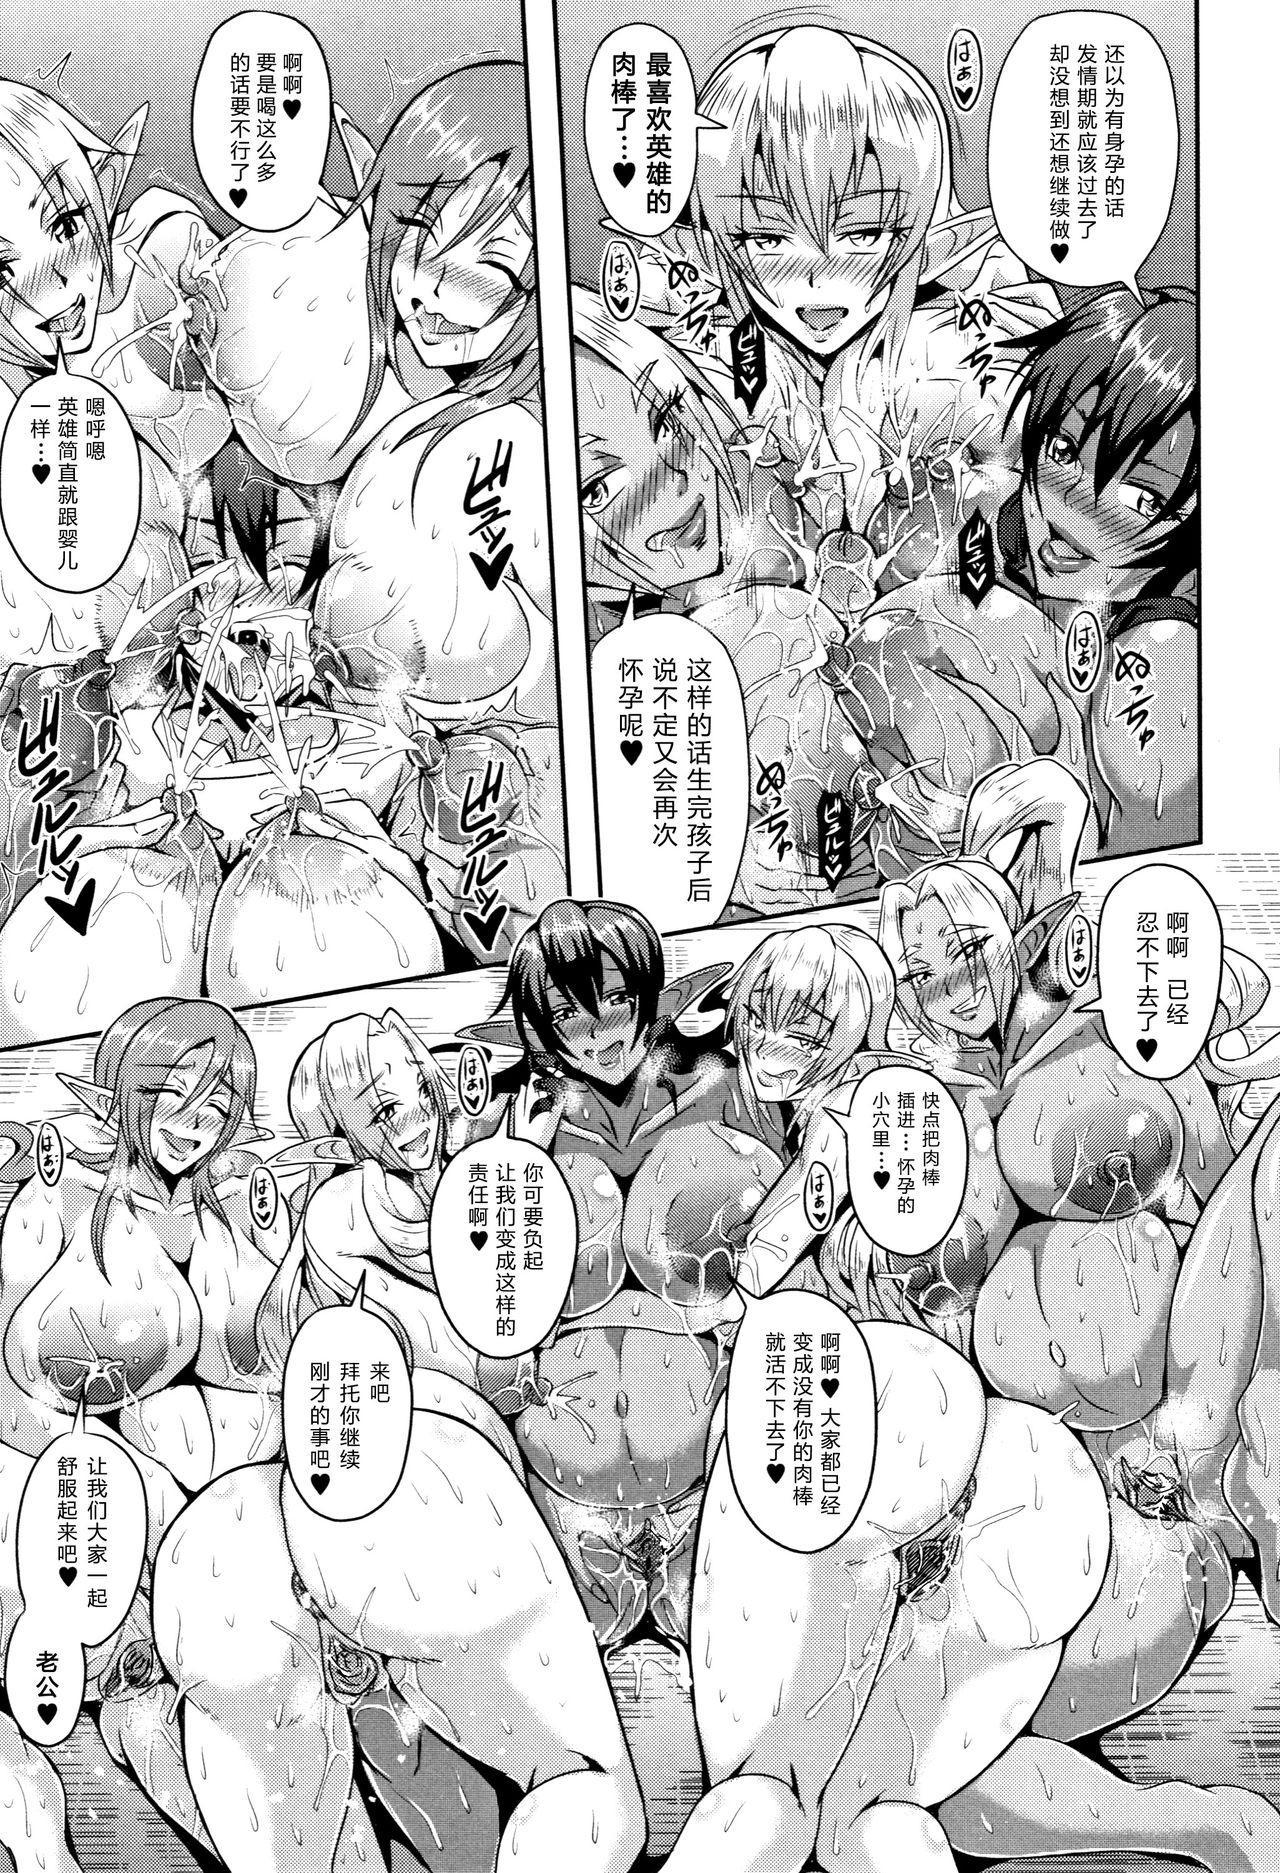 Elf Harem no Mori to Kozukuri Keiyaku | 妖精后宮生子契約 36